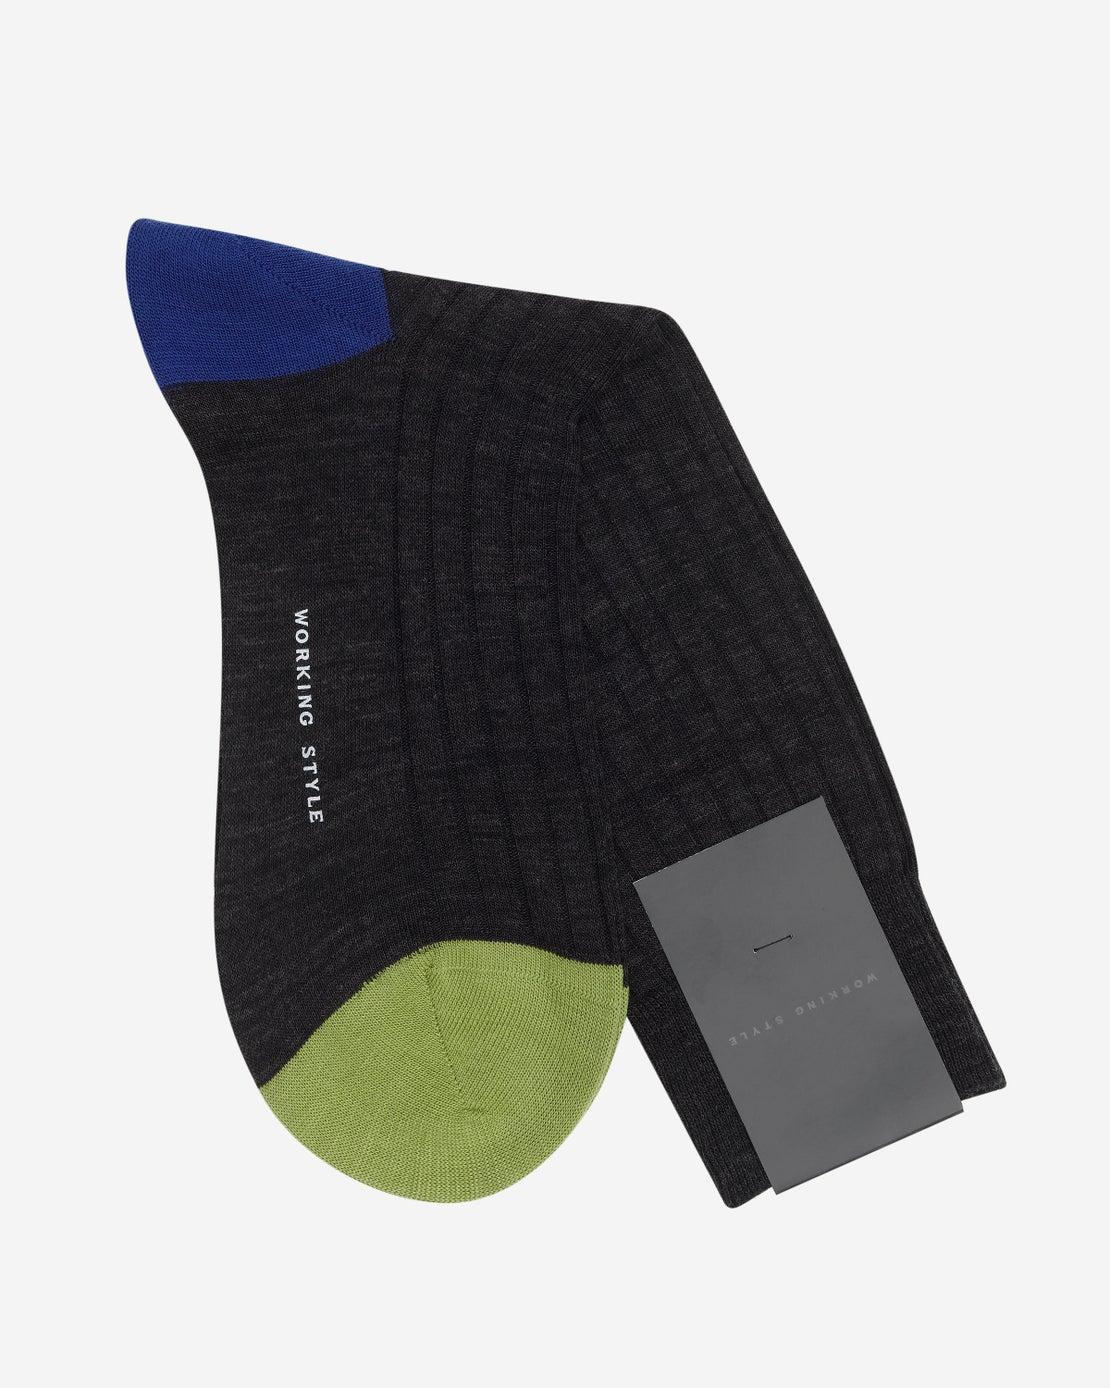 Charcoal Ribbed Heel & Toe Socks